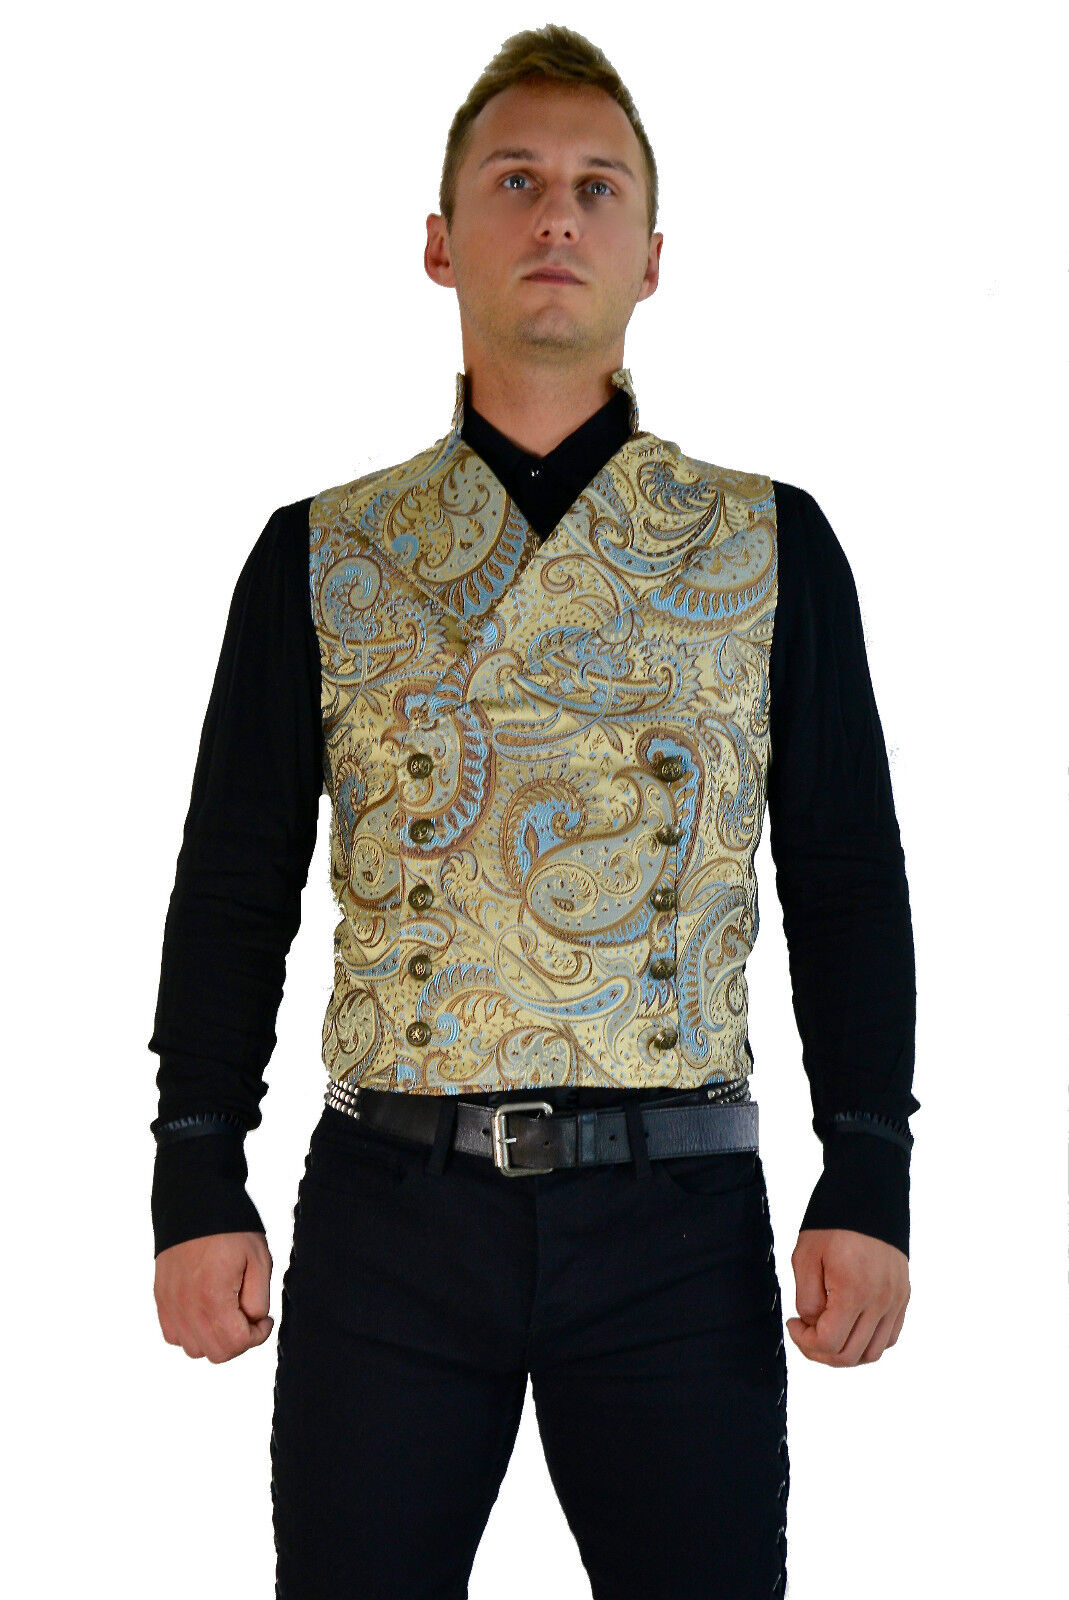 SHRINE GOTHIC VAMPIRE CAVALIER VEST JACKET VICTORIAN BROCADE GOTH STEAMPUNK Clothing, Shoes & Accessories